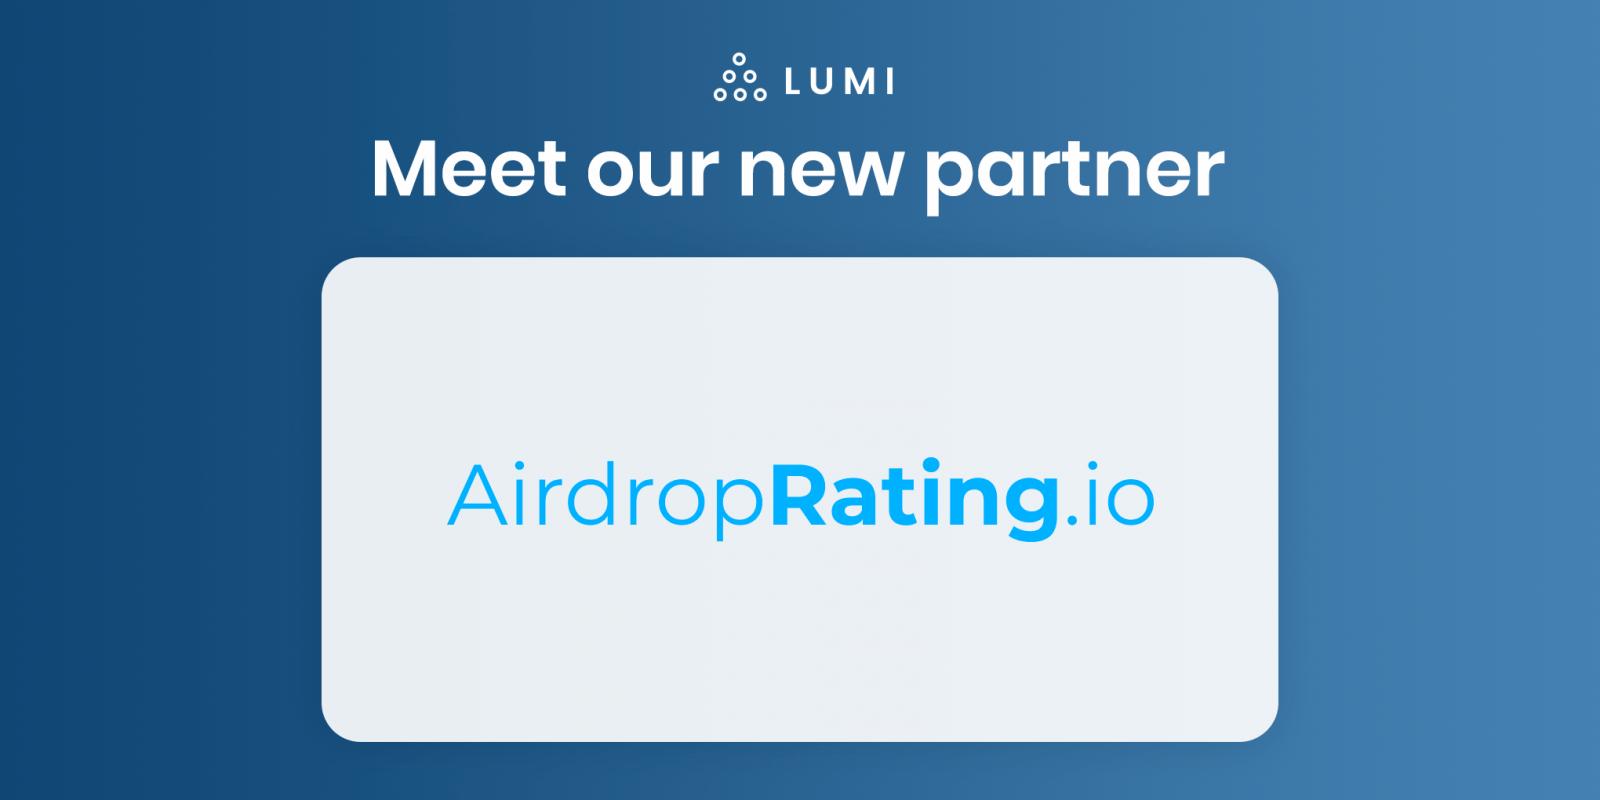 partnership between lumi wallet and airdroprating